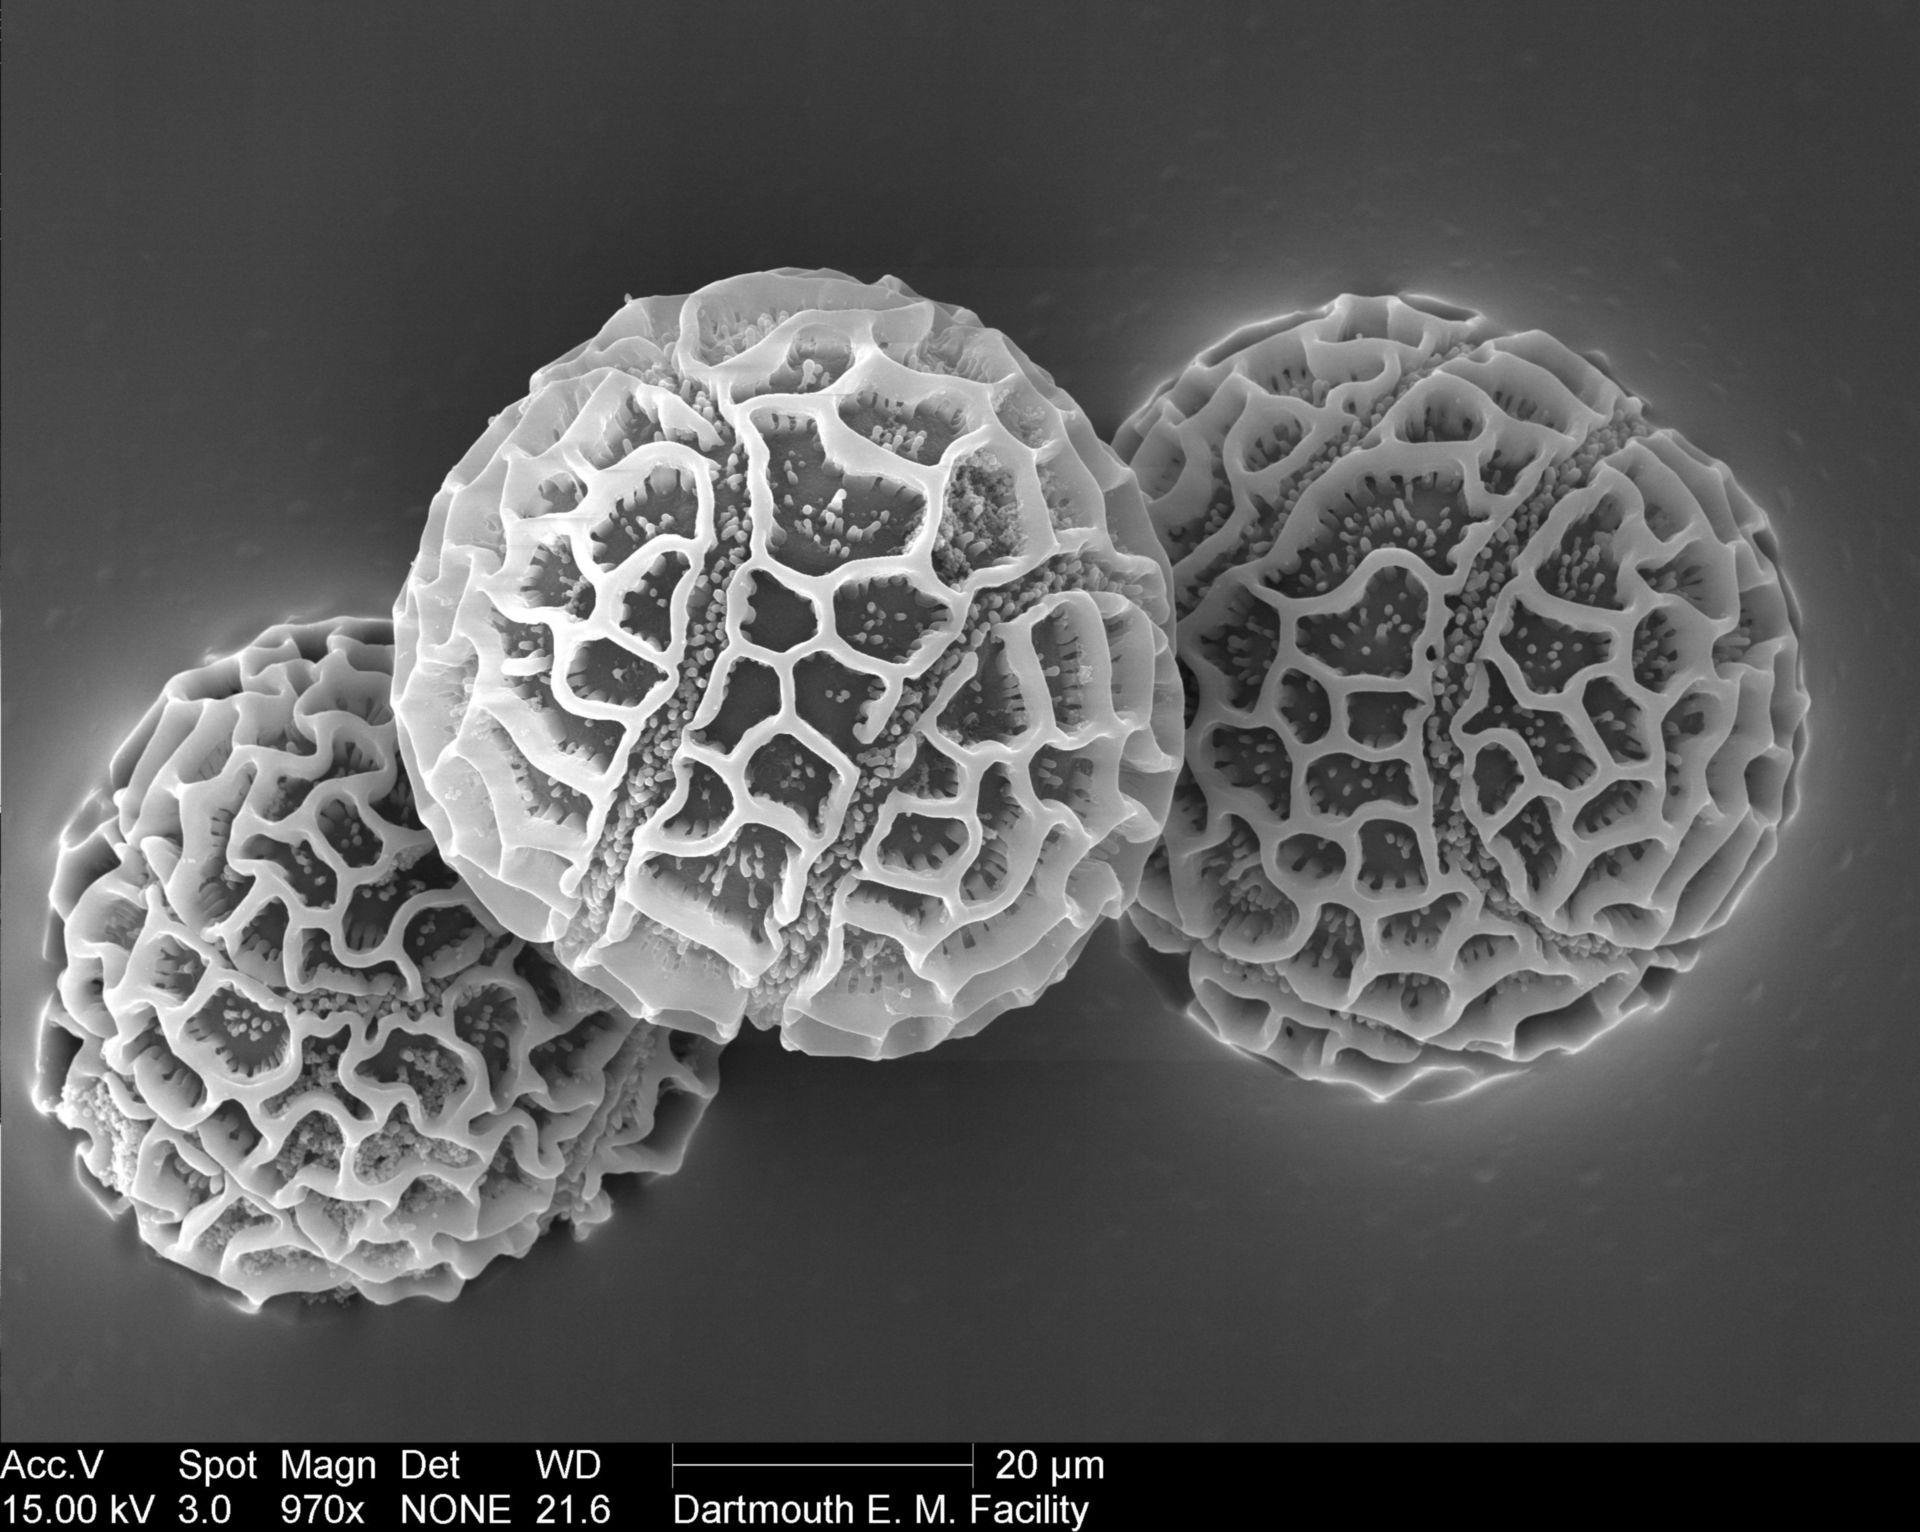 Passiflora edulis (Pollen wall) - CIL:39344